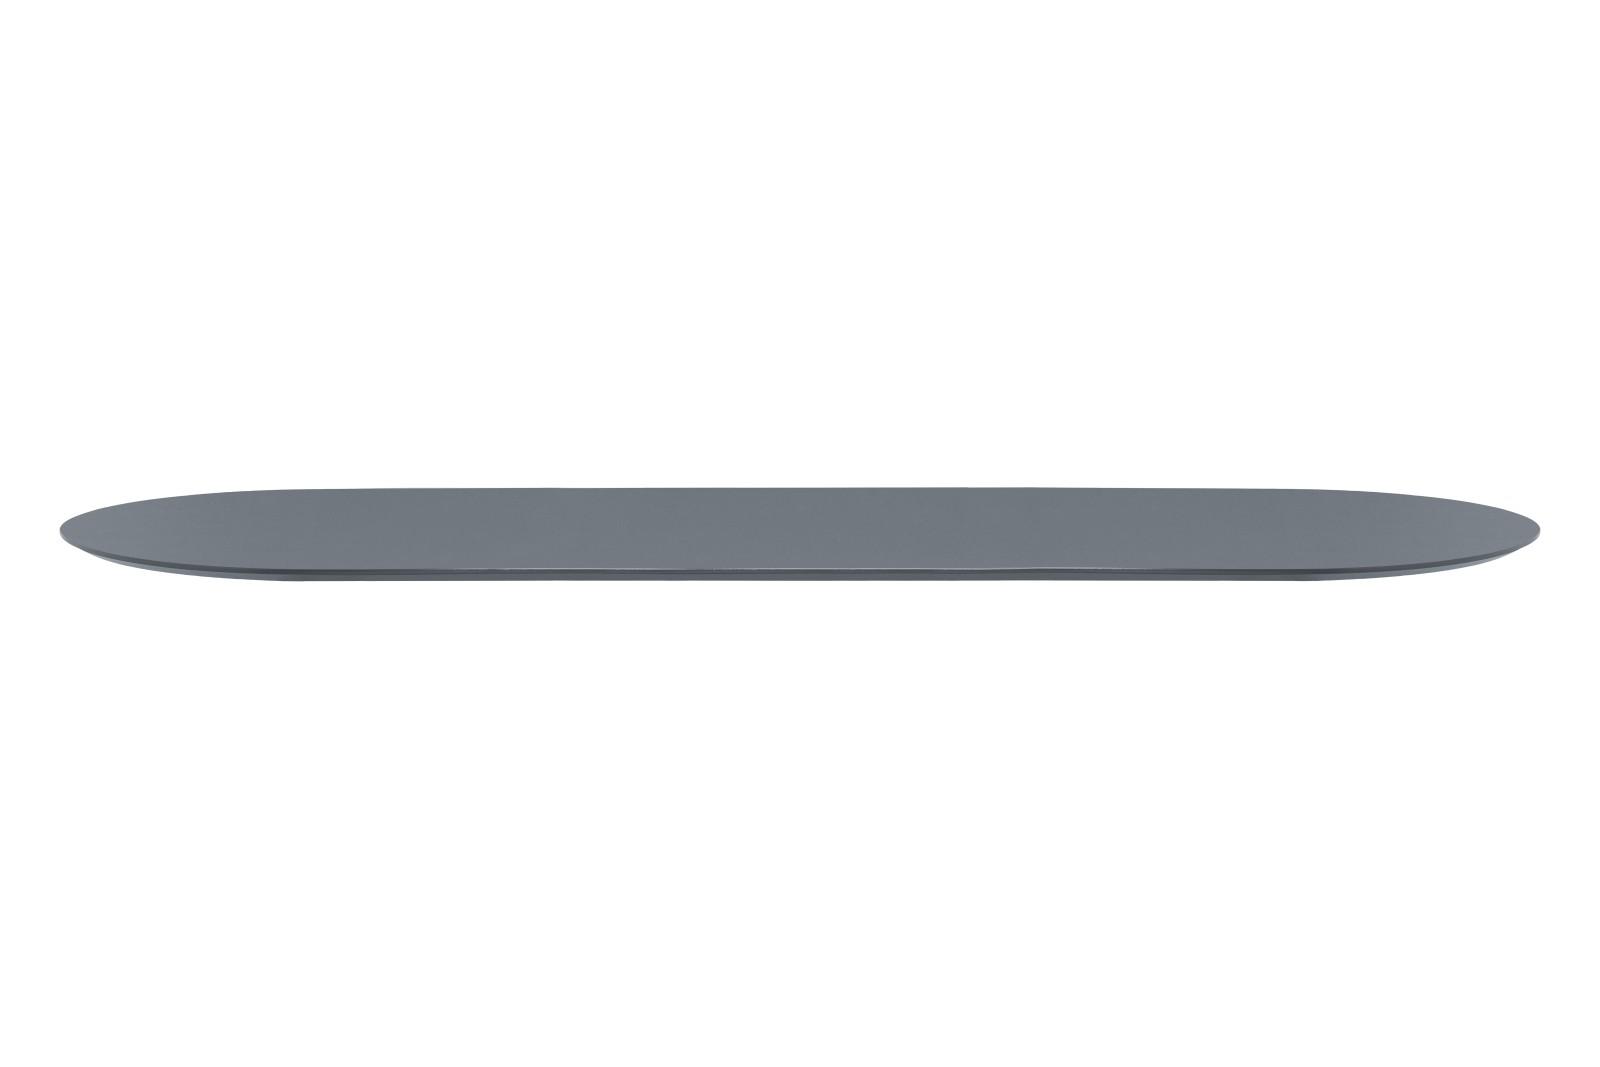 Mingle Oval Table Top Dusty Blue Linoleum, 90 x 220cm